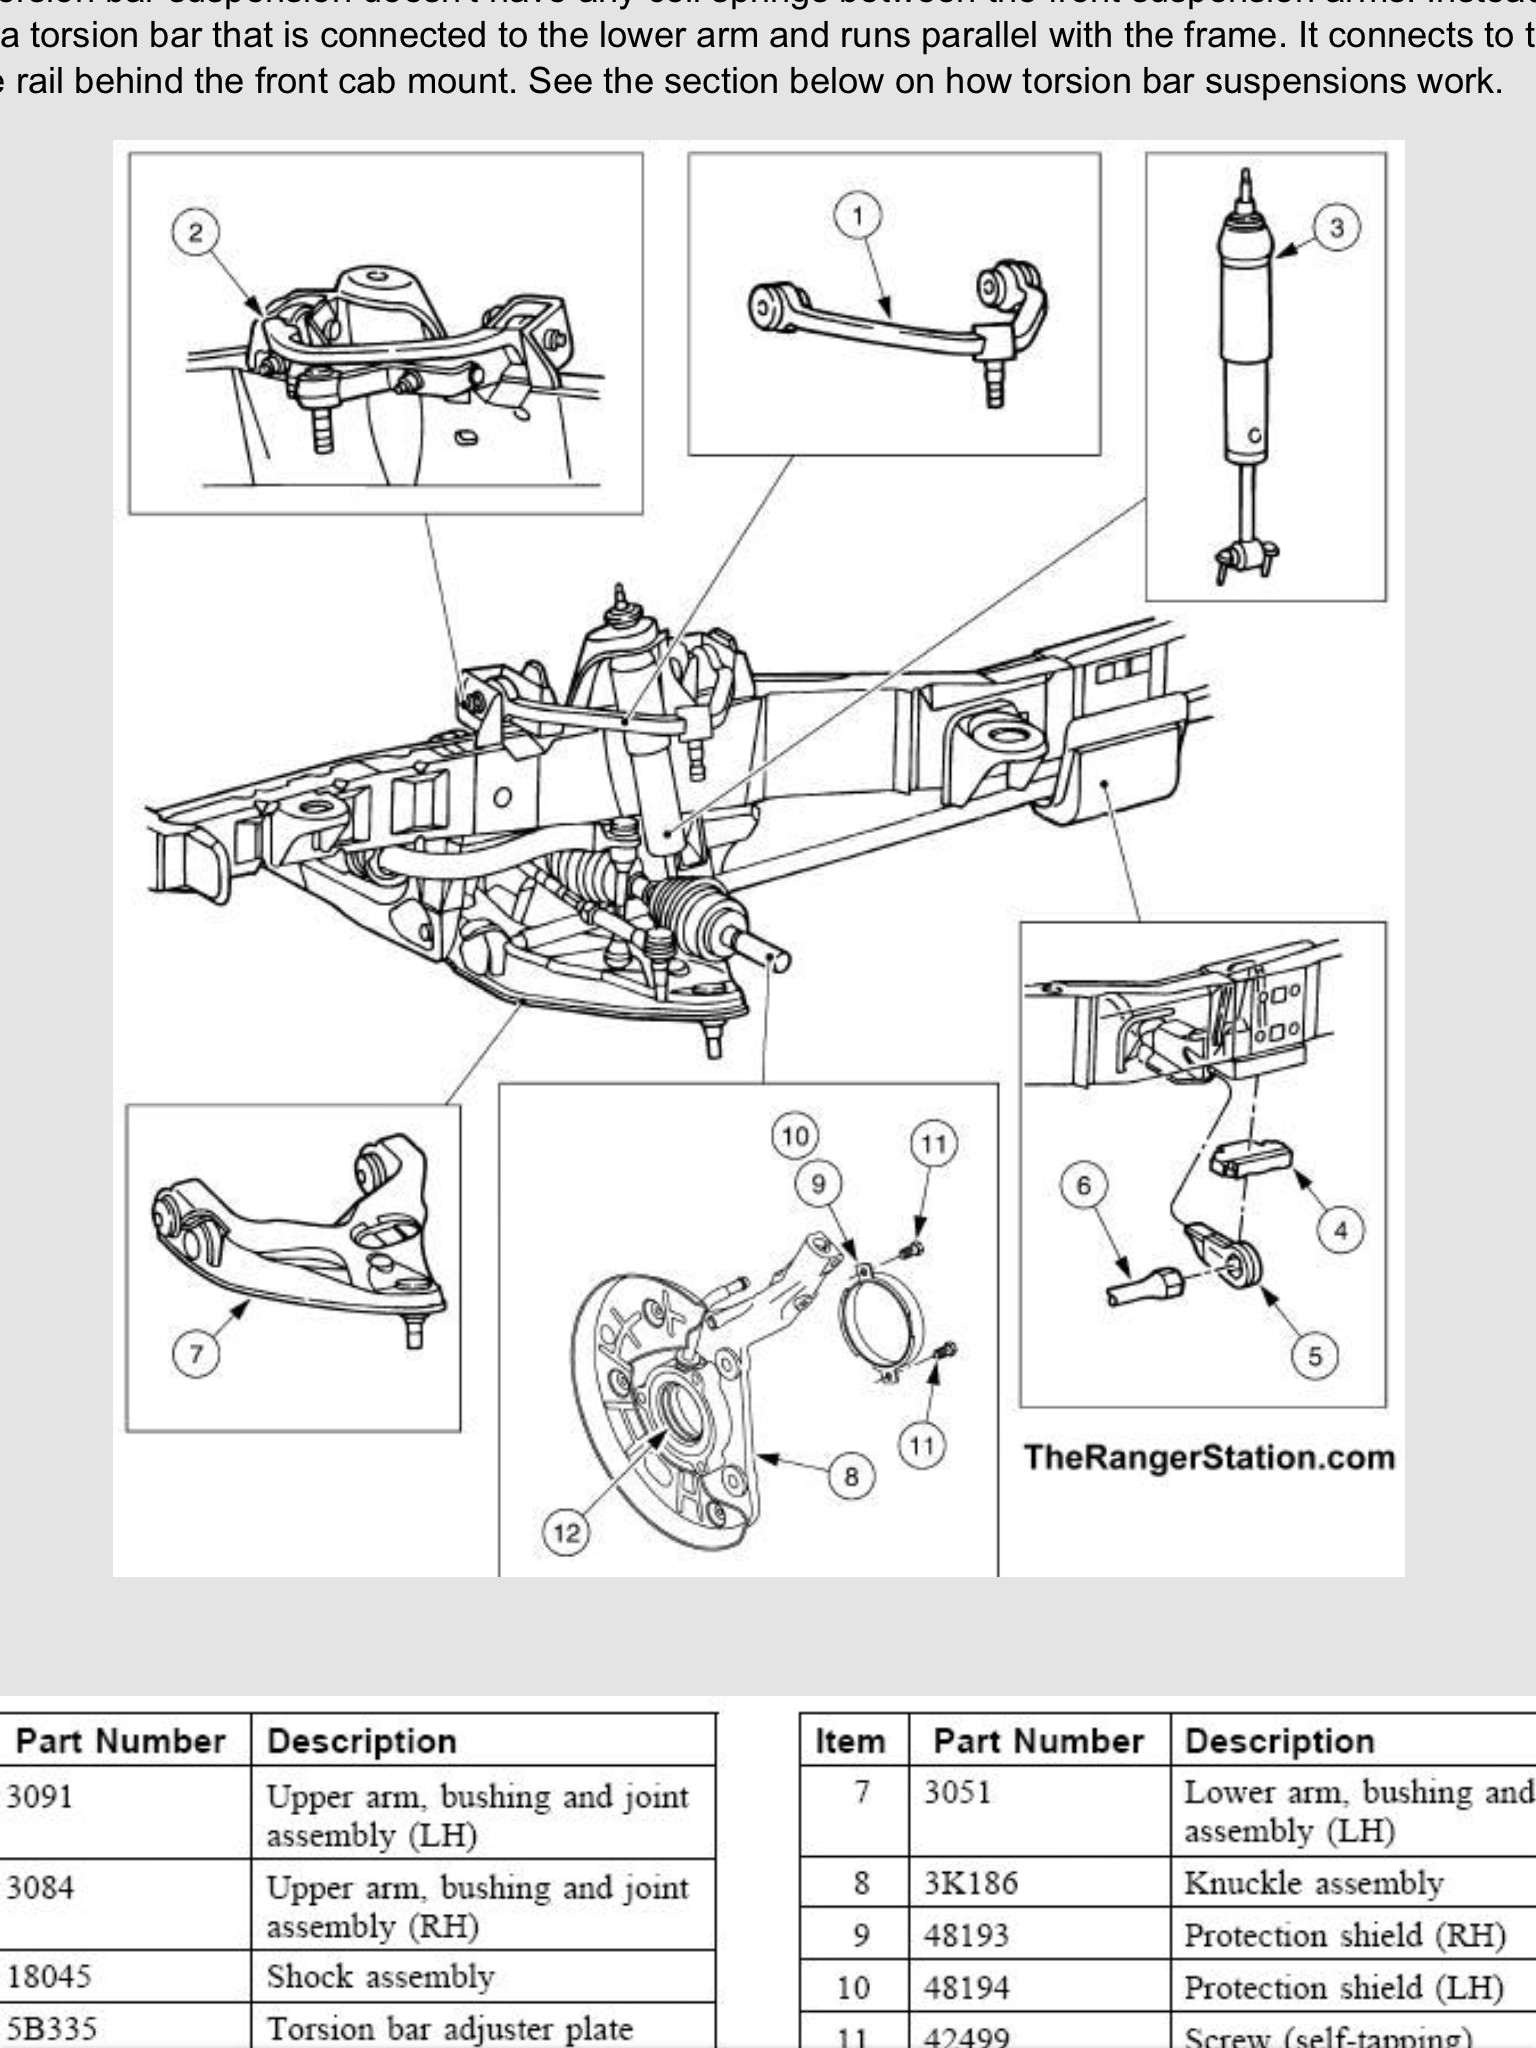 Steering Suspension Diagram Pin by Tedja Alvin On Serba Serbi Mesin Of Steering Suspension Diagram